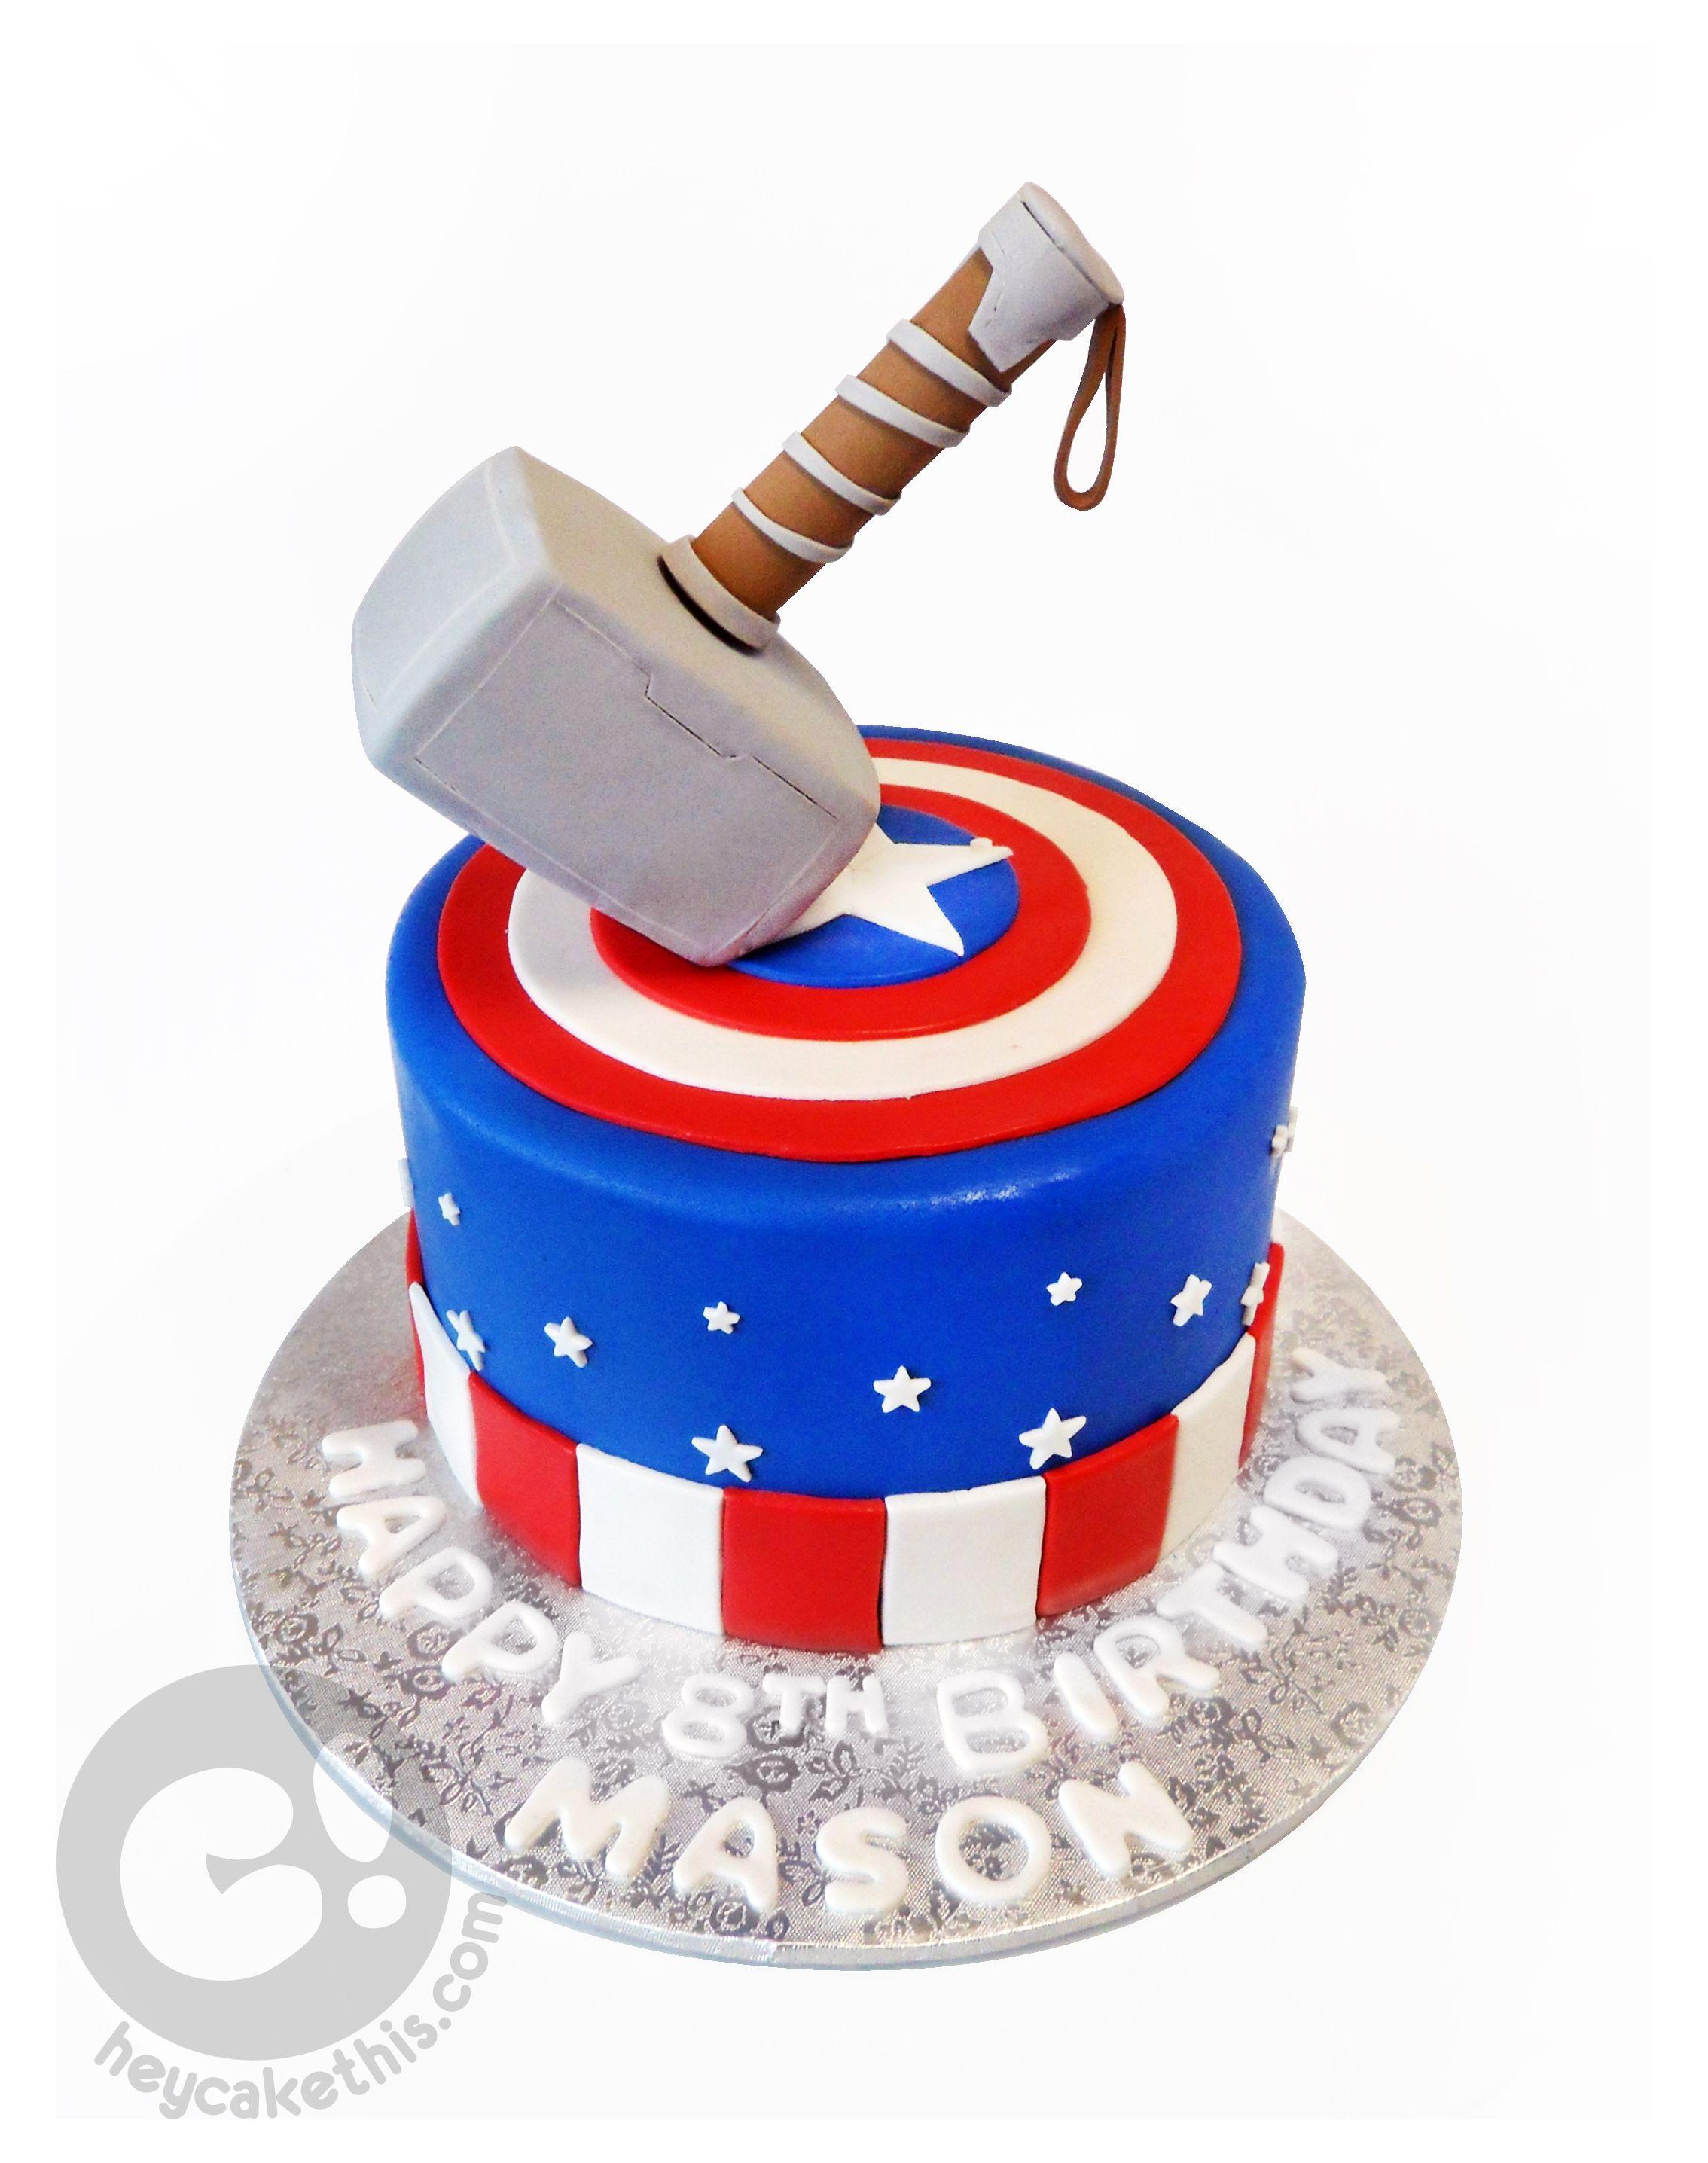 Awe Inspiring Captain America And Thor Themed Birthday Cake Captain Americas Personalised Birthday Cards Paralily Jamesorg